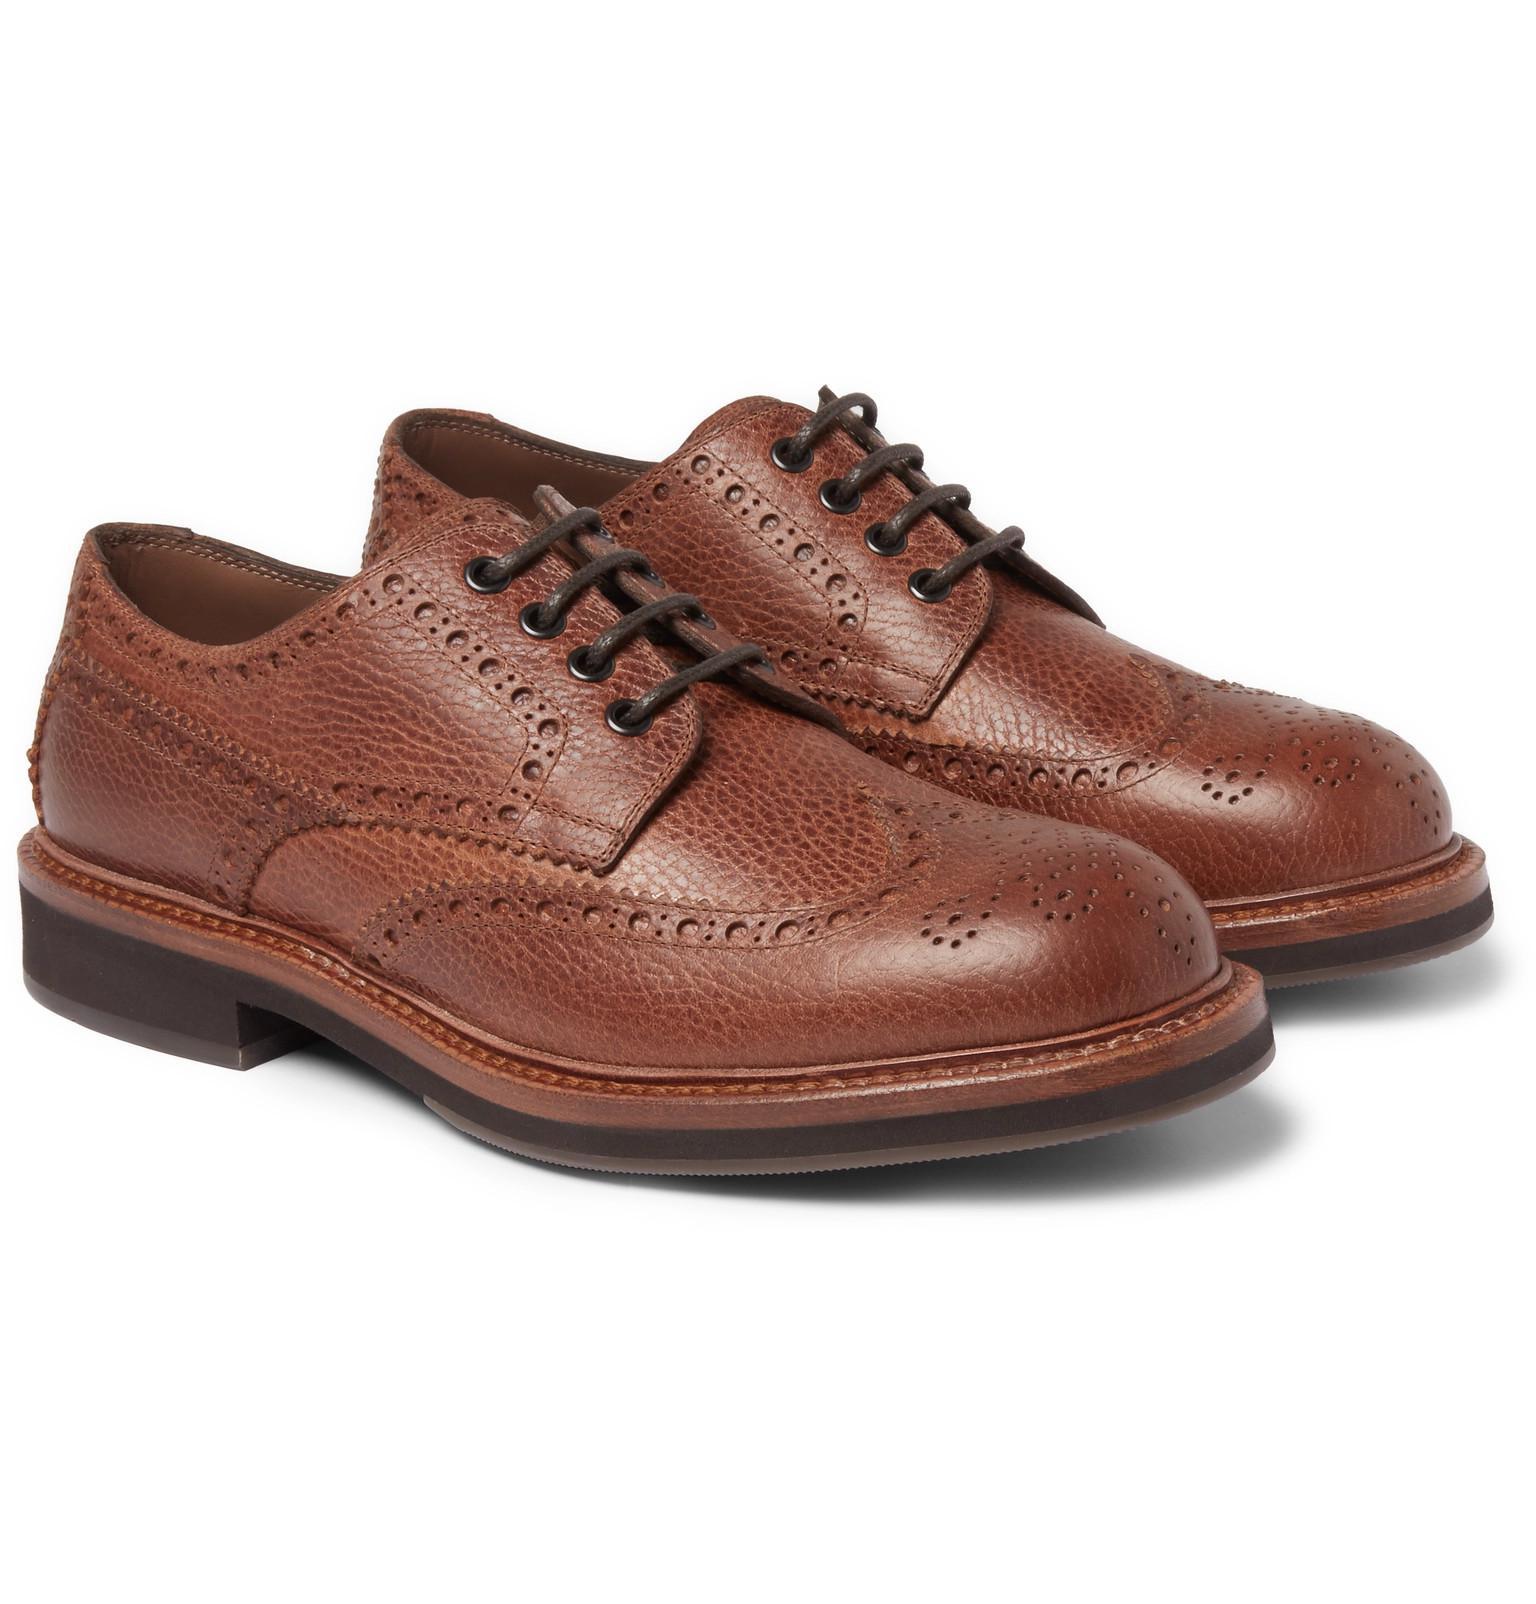 Burnished-leather Cap-toe Derby Shoes Brunello Cucinelli 8SC5Qp